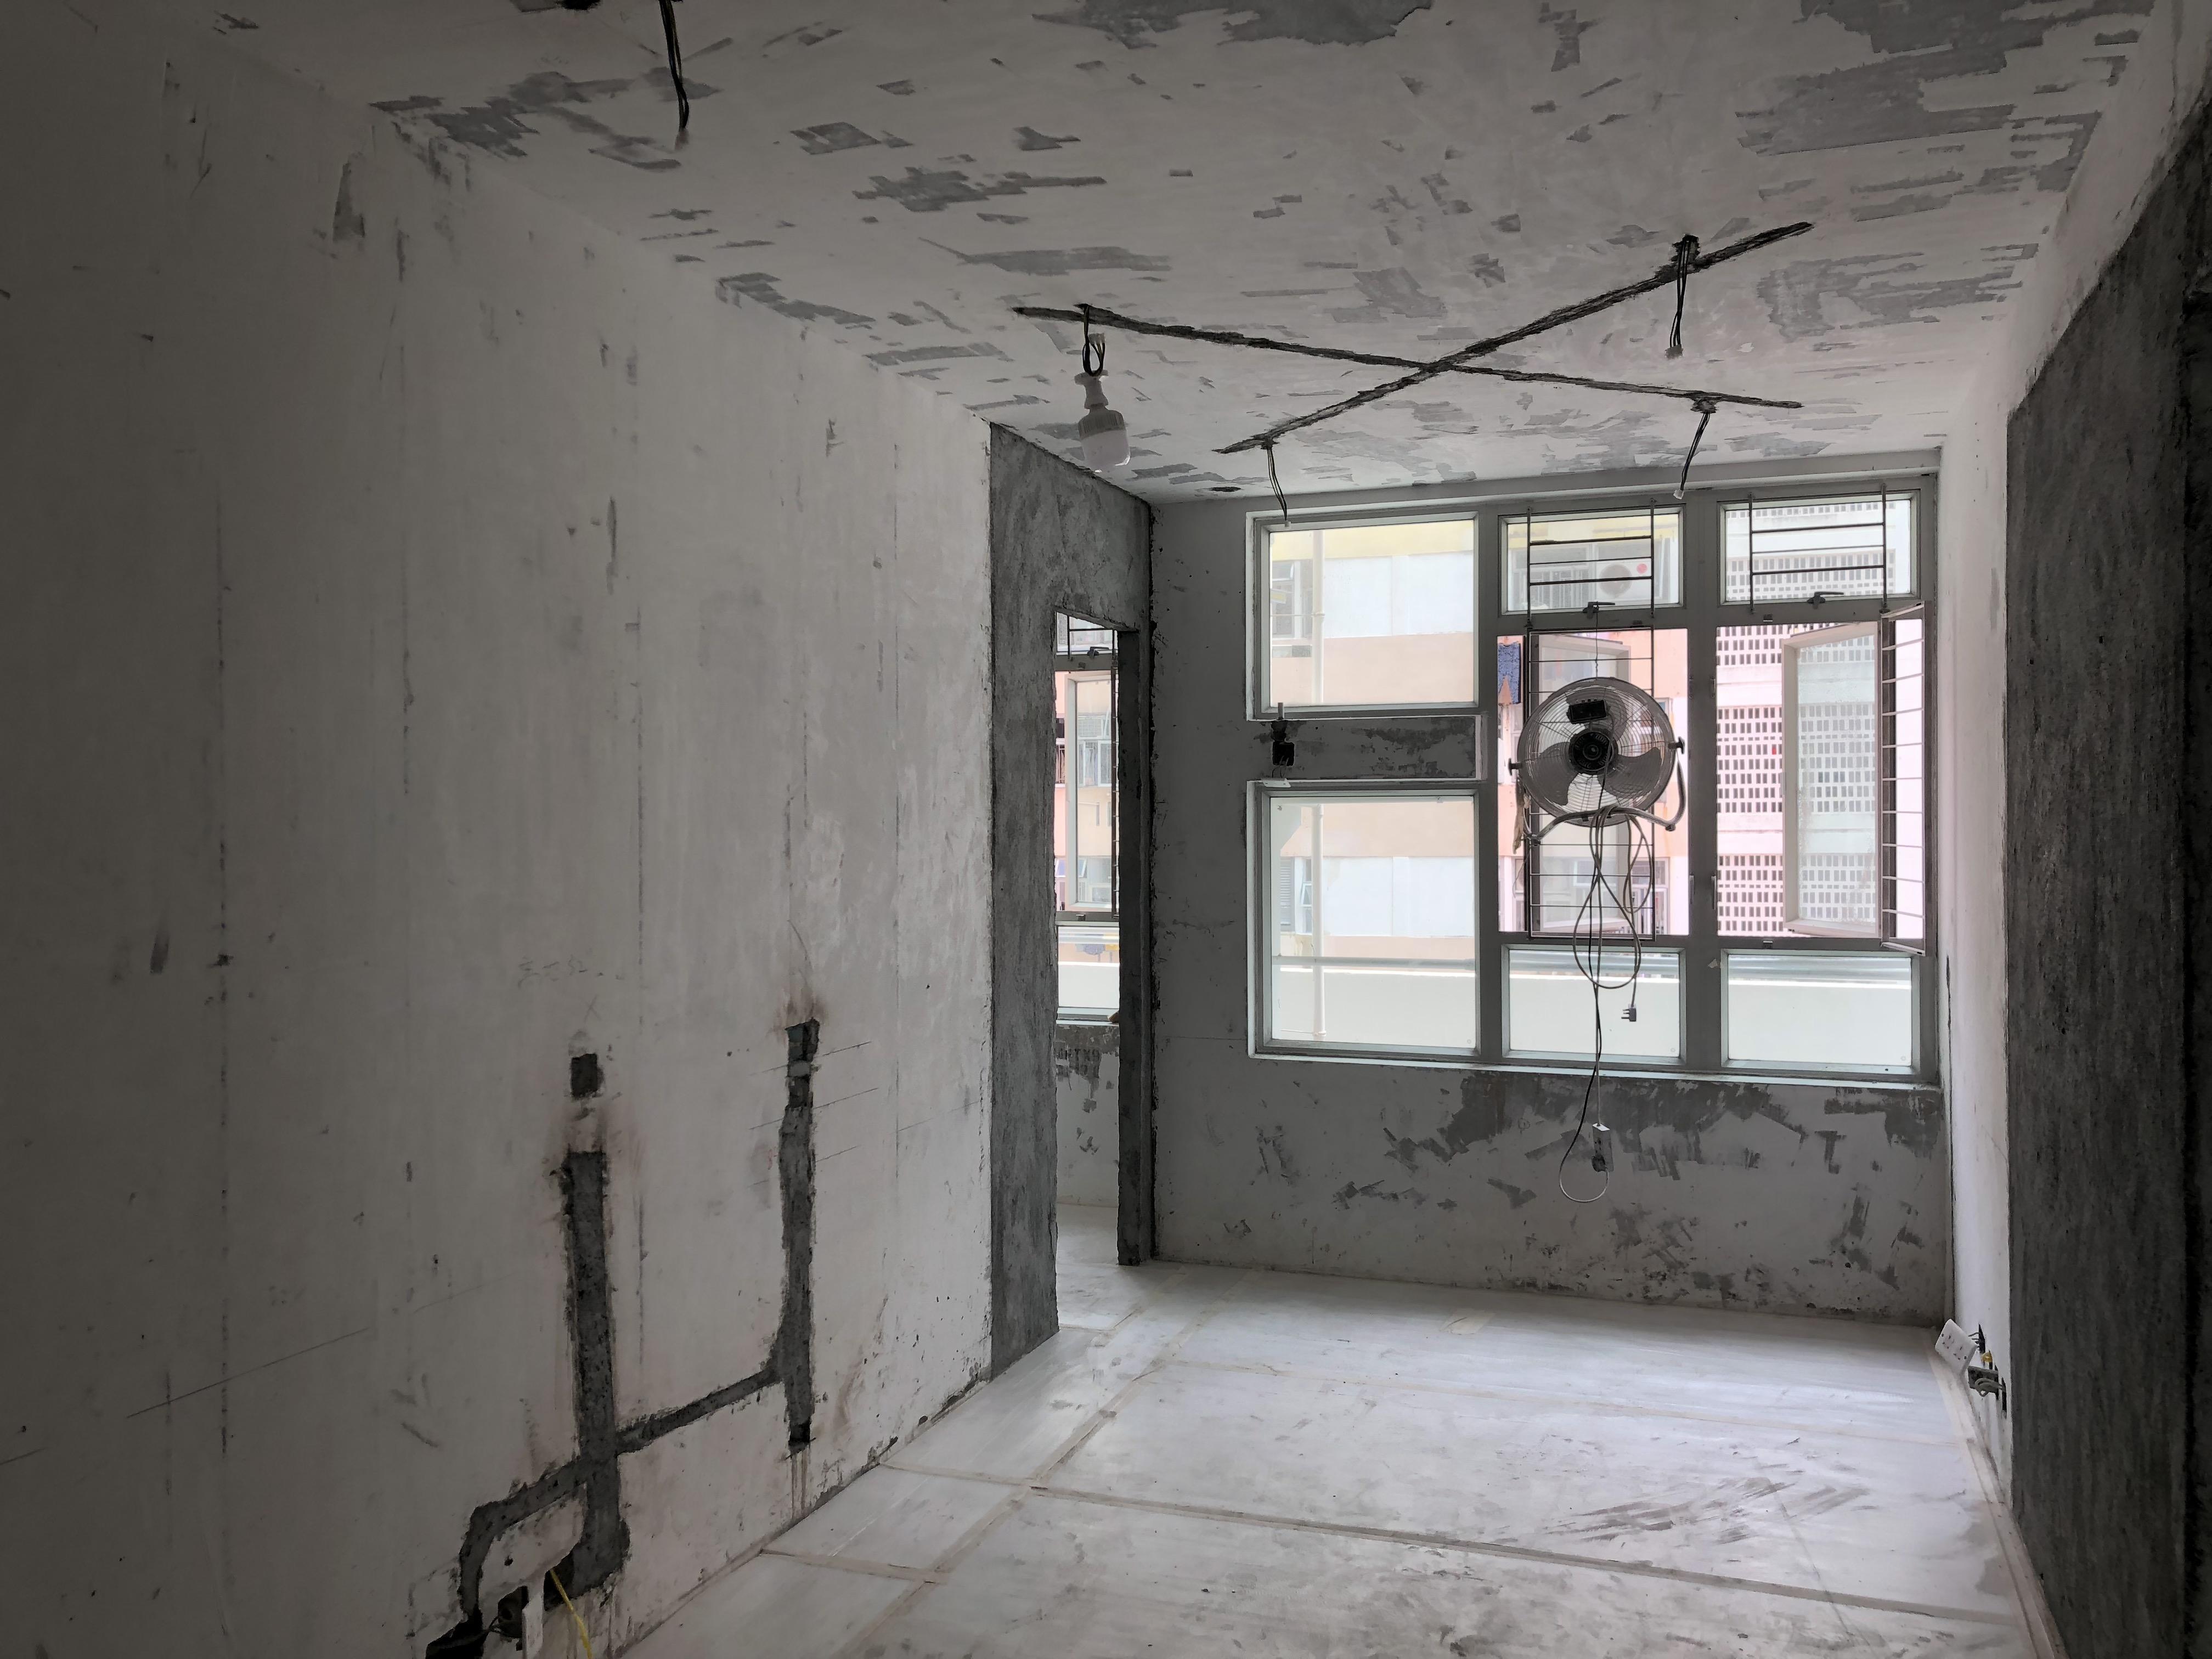 Inch Interior Design Hong Kong - Shek Kip Mei Estate - Renovations